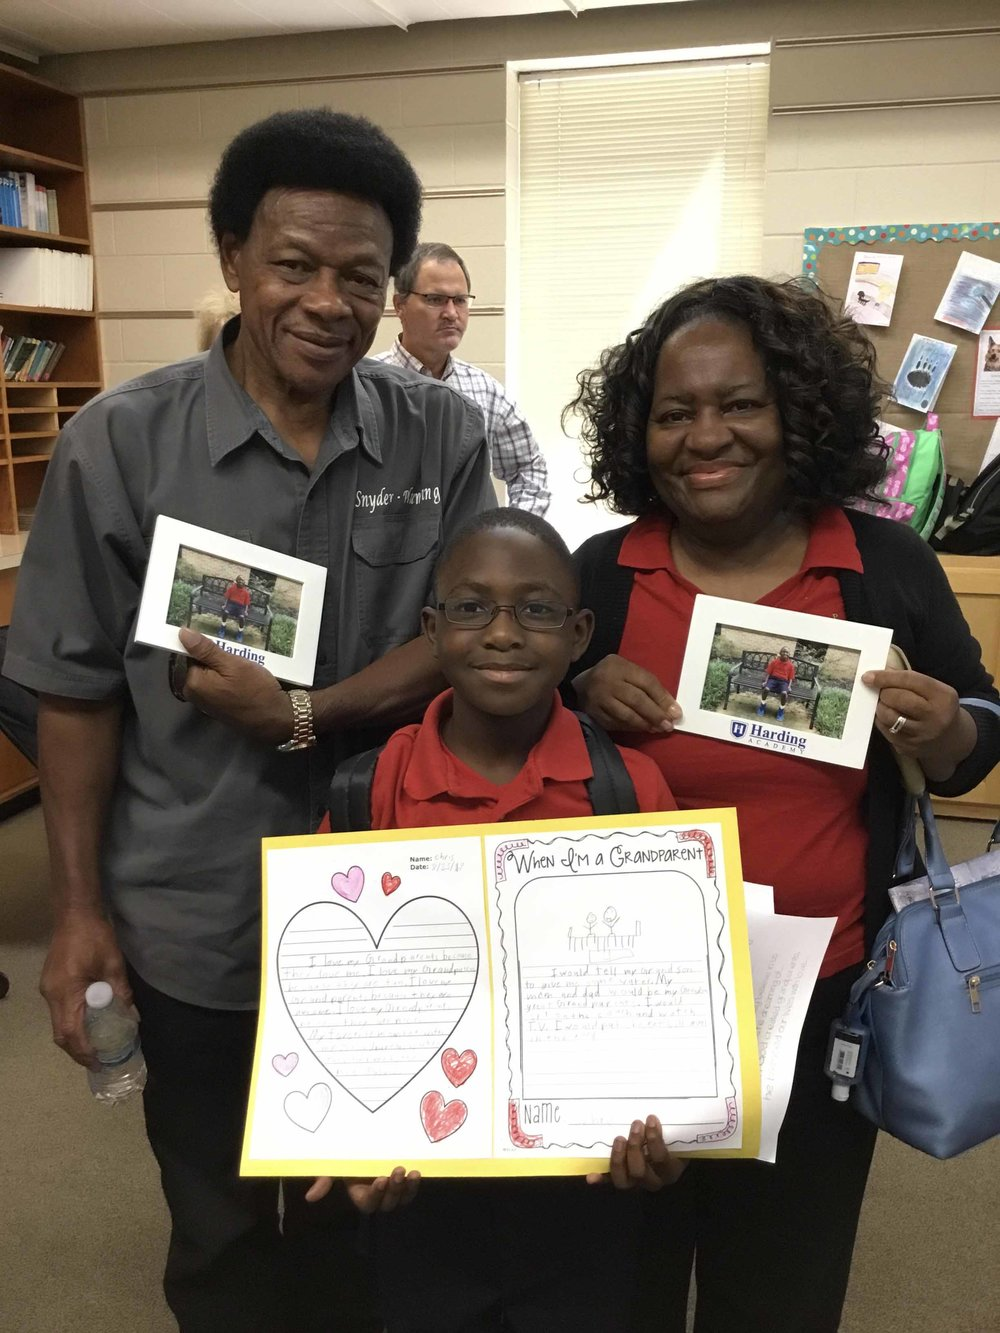 Aug25 WSLS Grandparents Day02.jpg